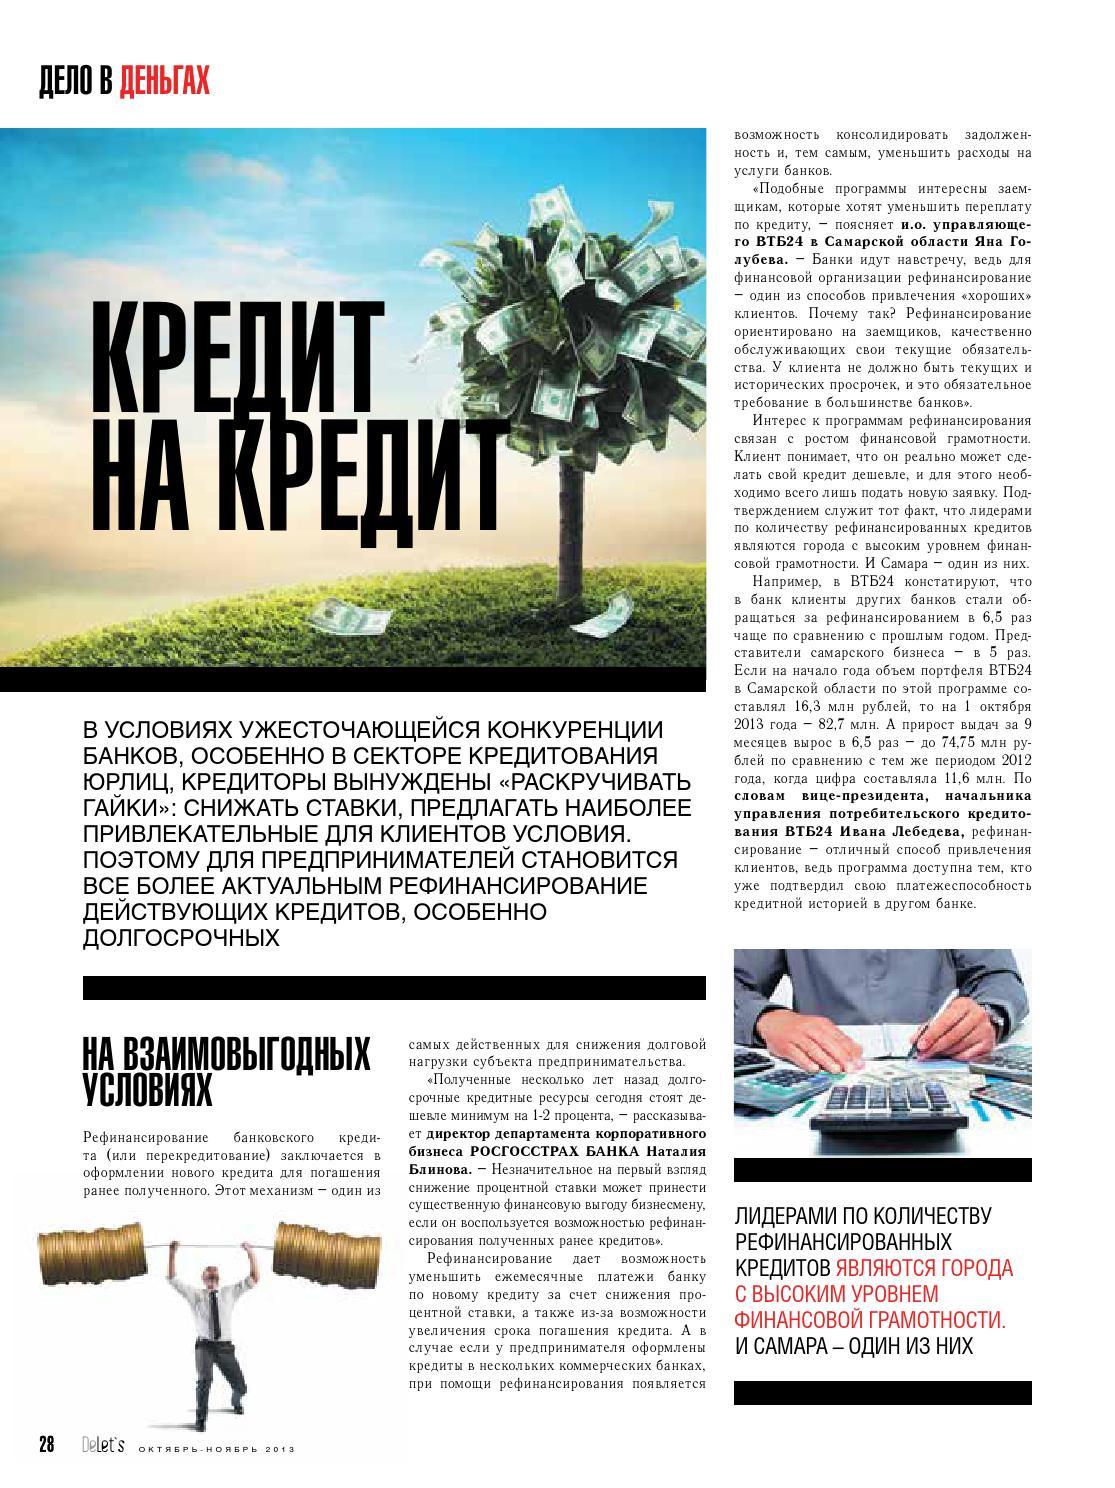 скворцова заняла пост руководителя фмба россии